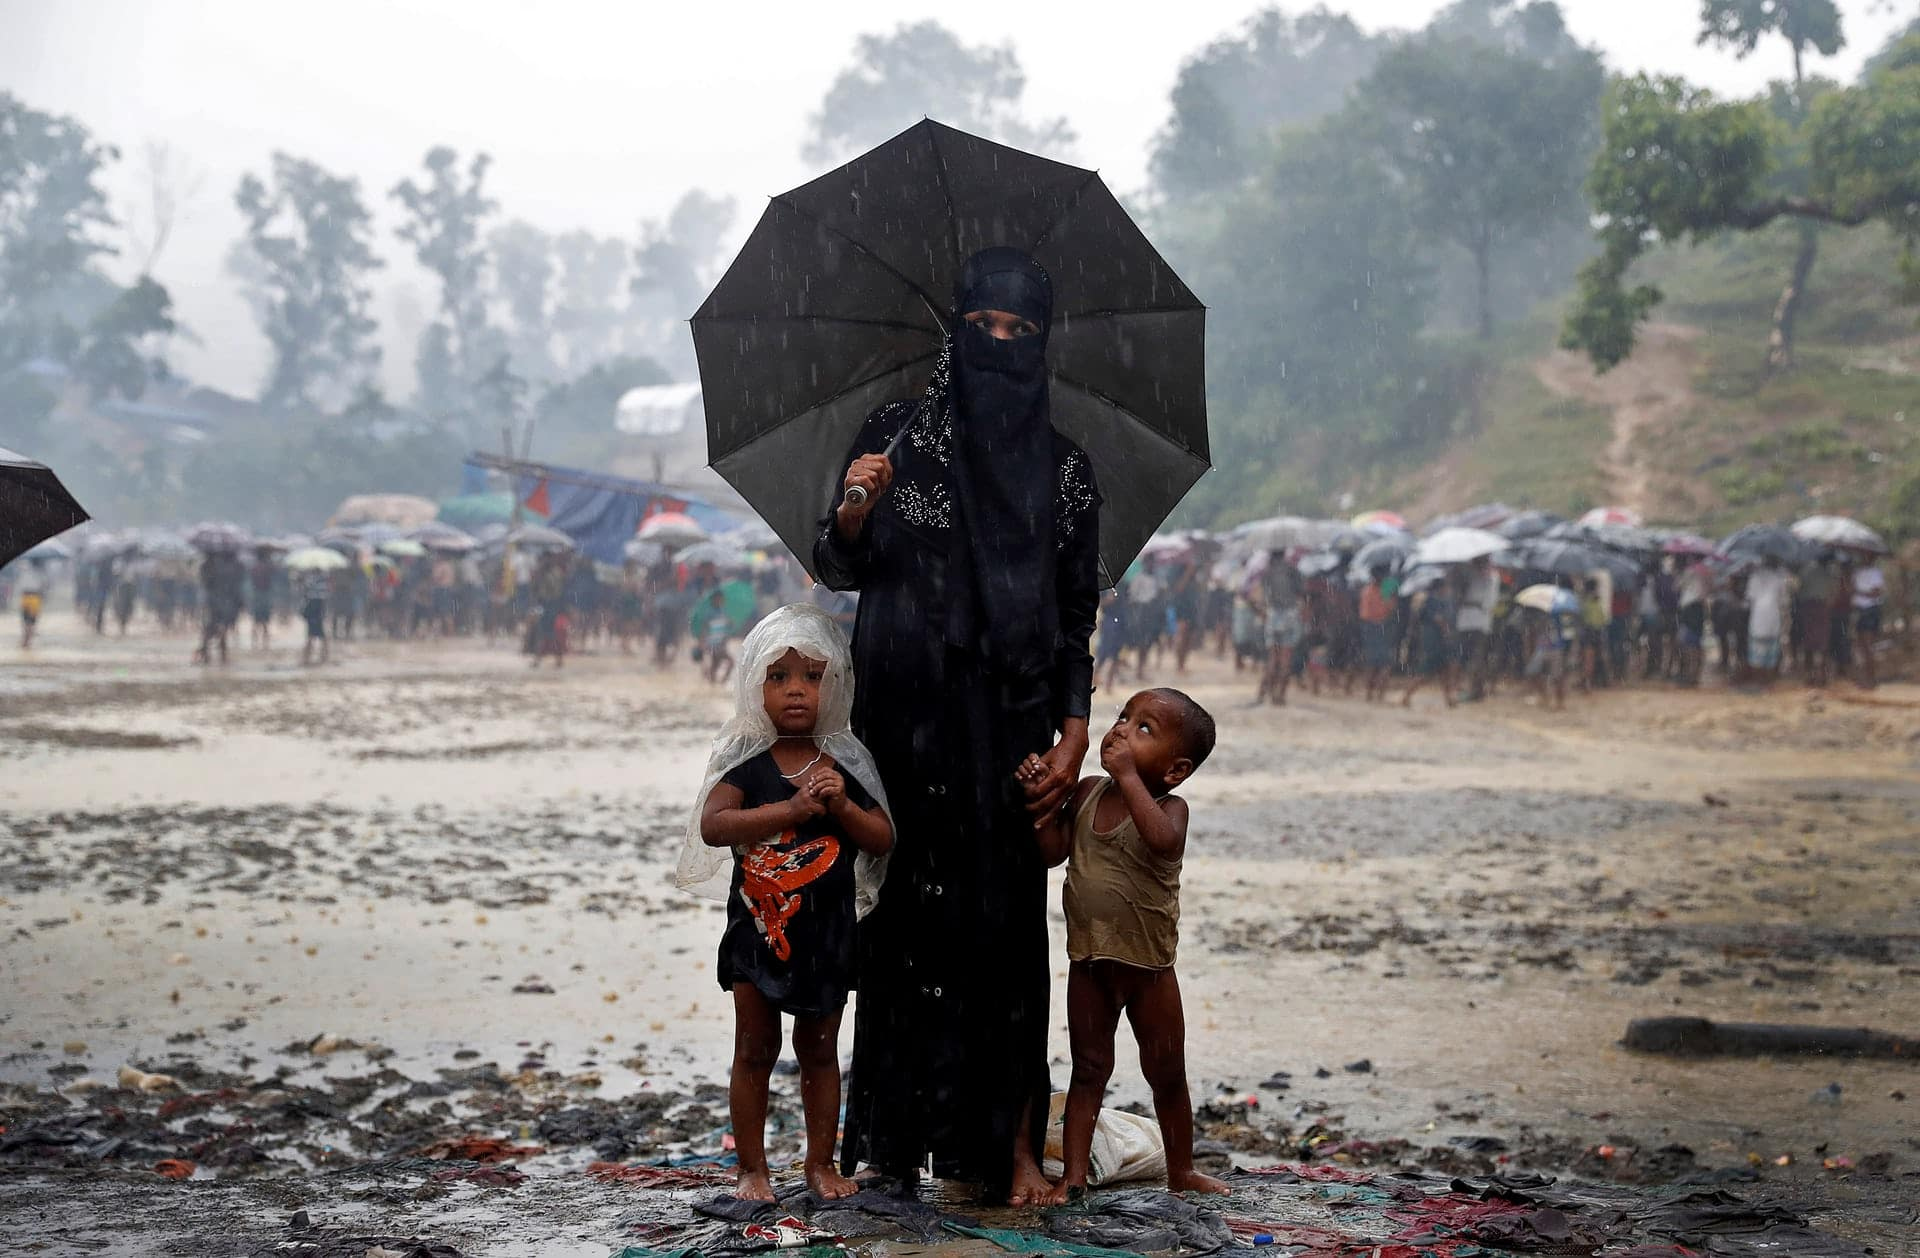 Alcuni rifugiati rohingya in un campo profughi in Bangladesh